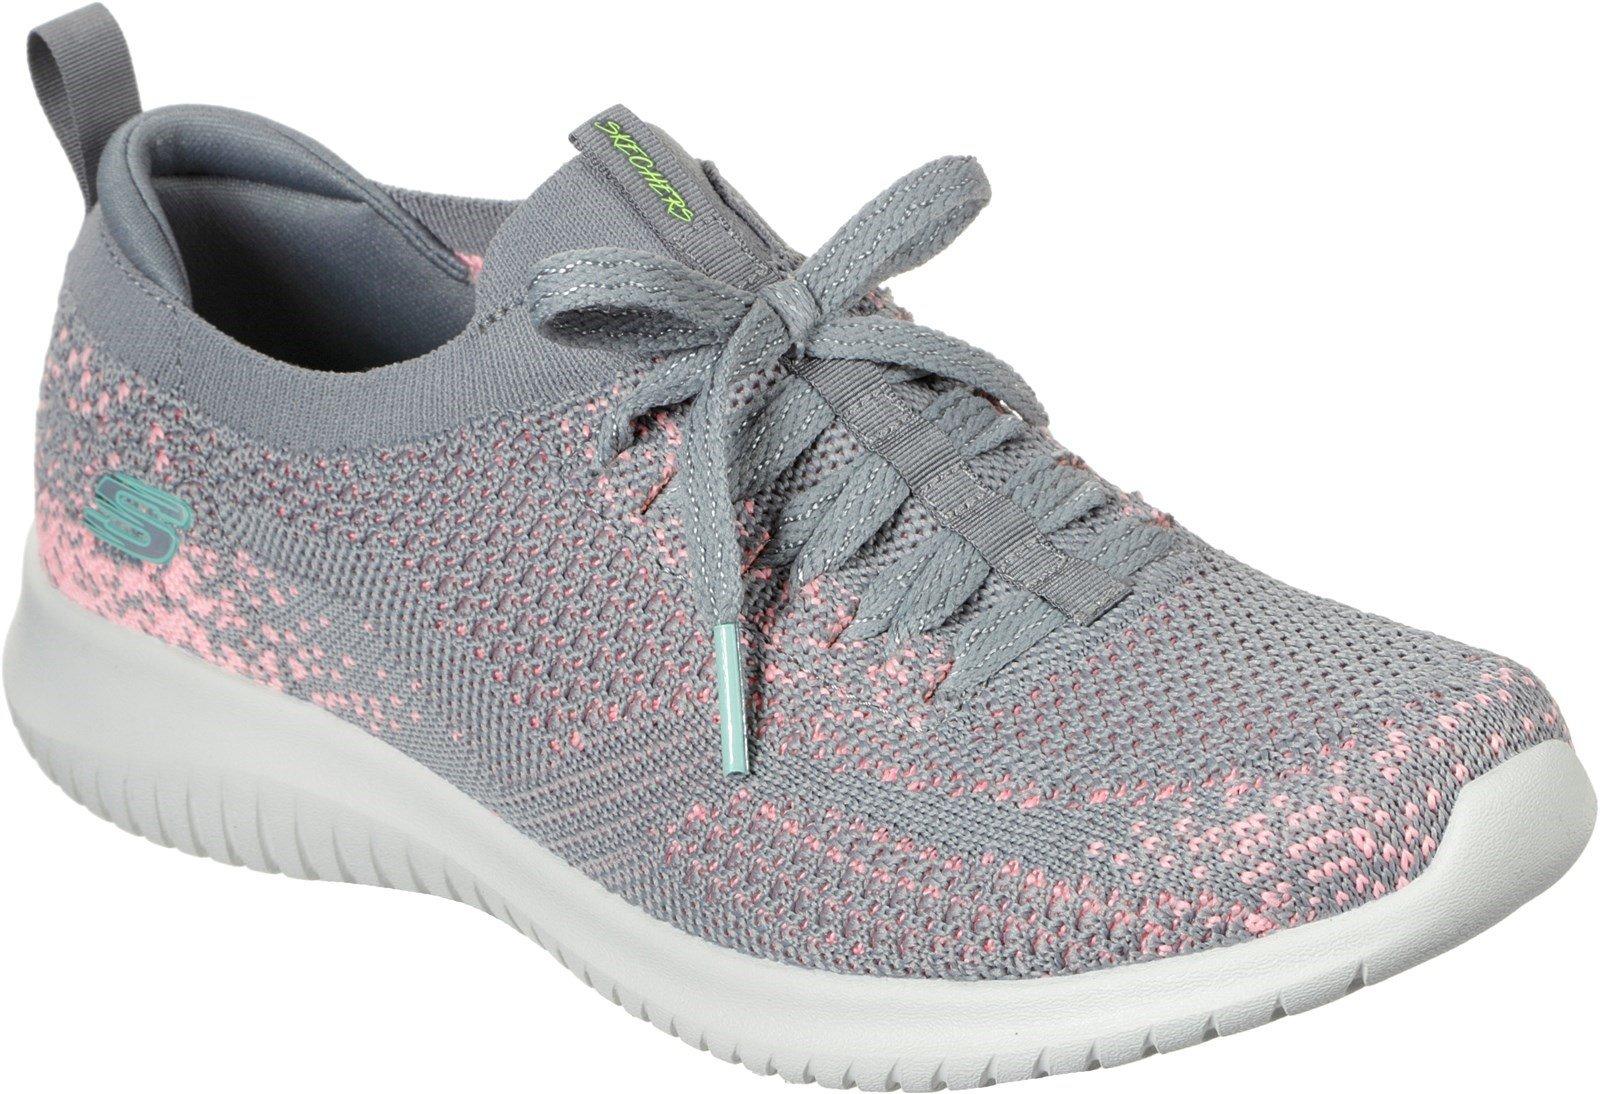 Skechers Women's Ultra Flex Twilight Twinkle Trainer Various Colours 31051 - Grey/Pink 3